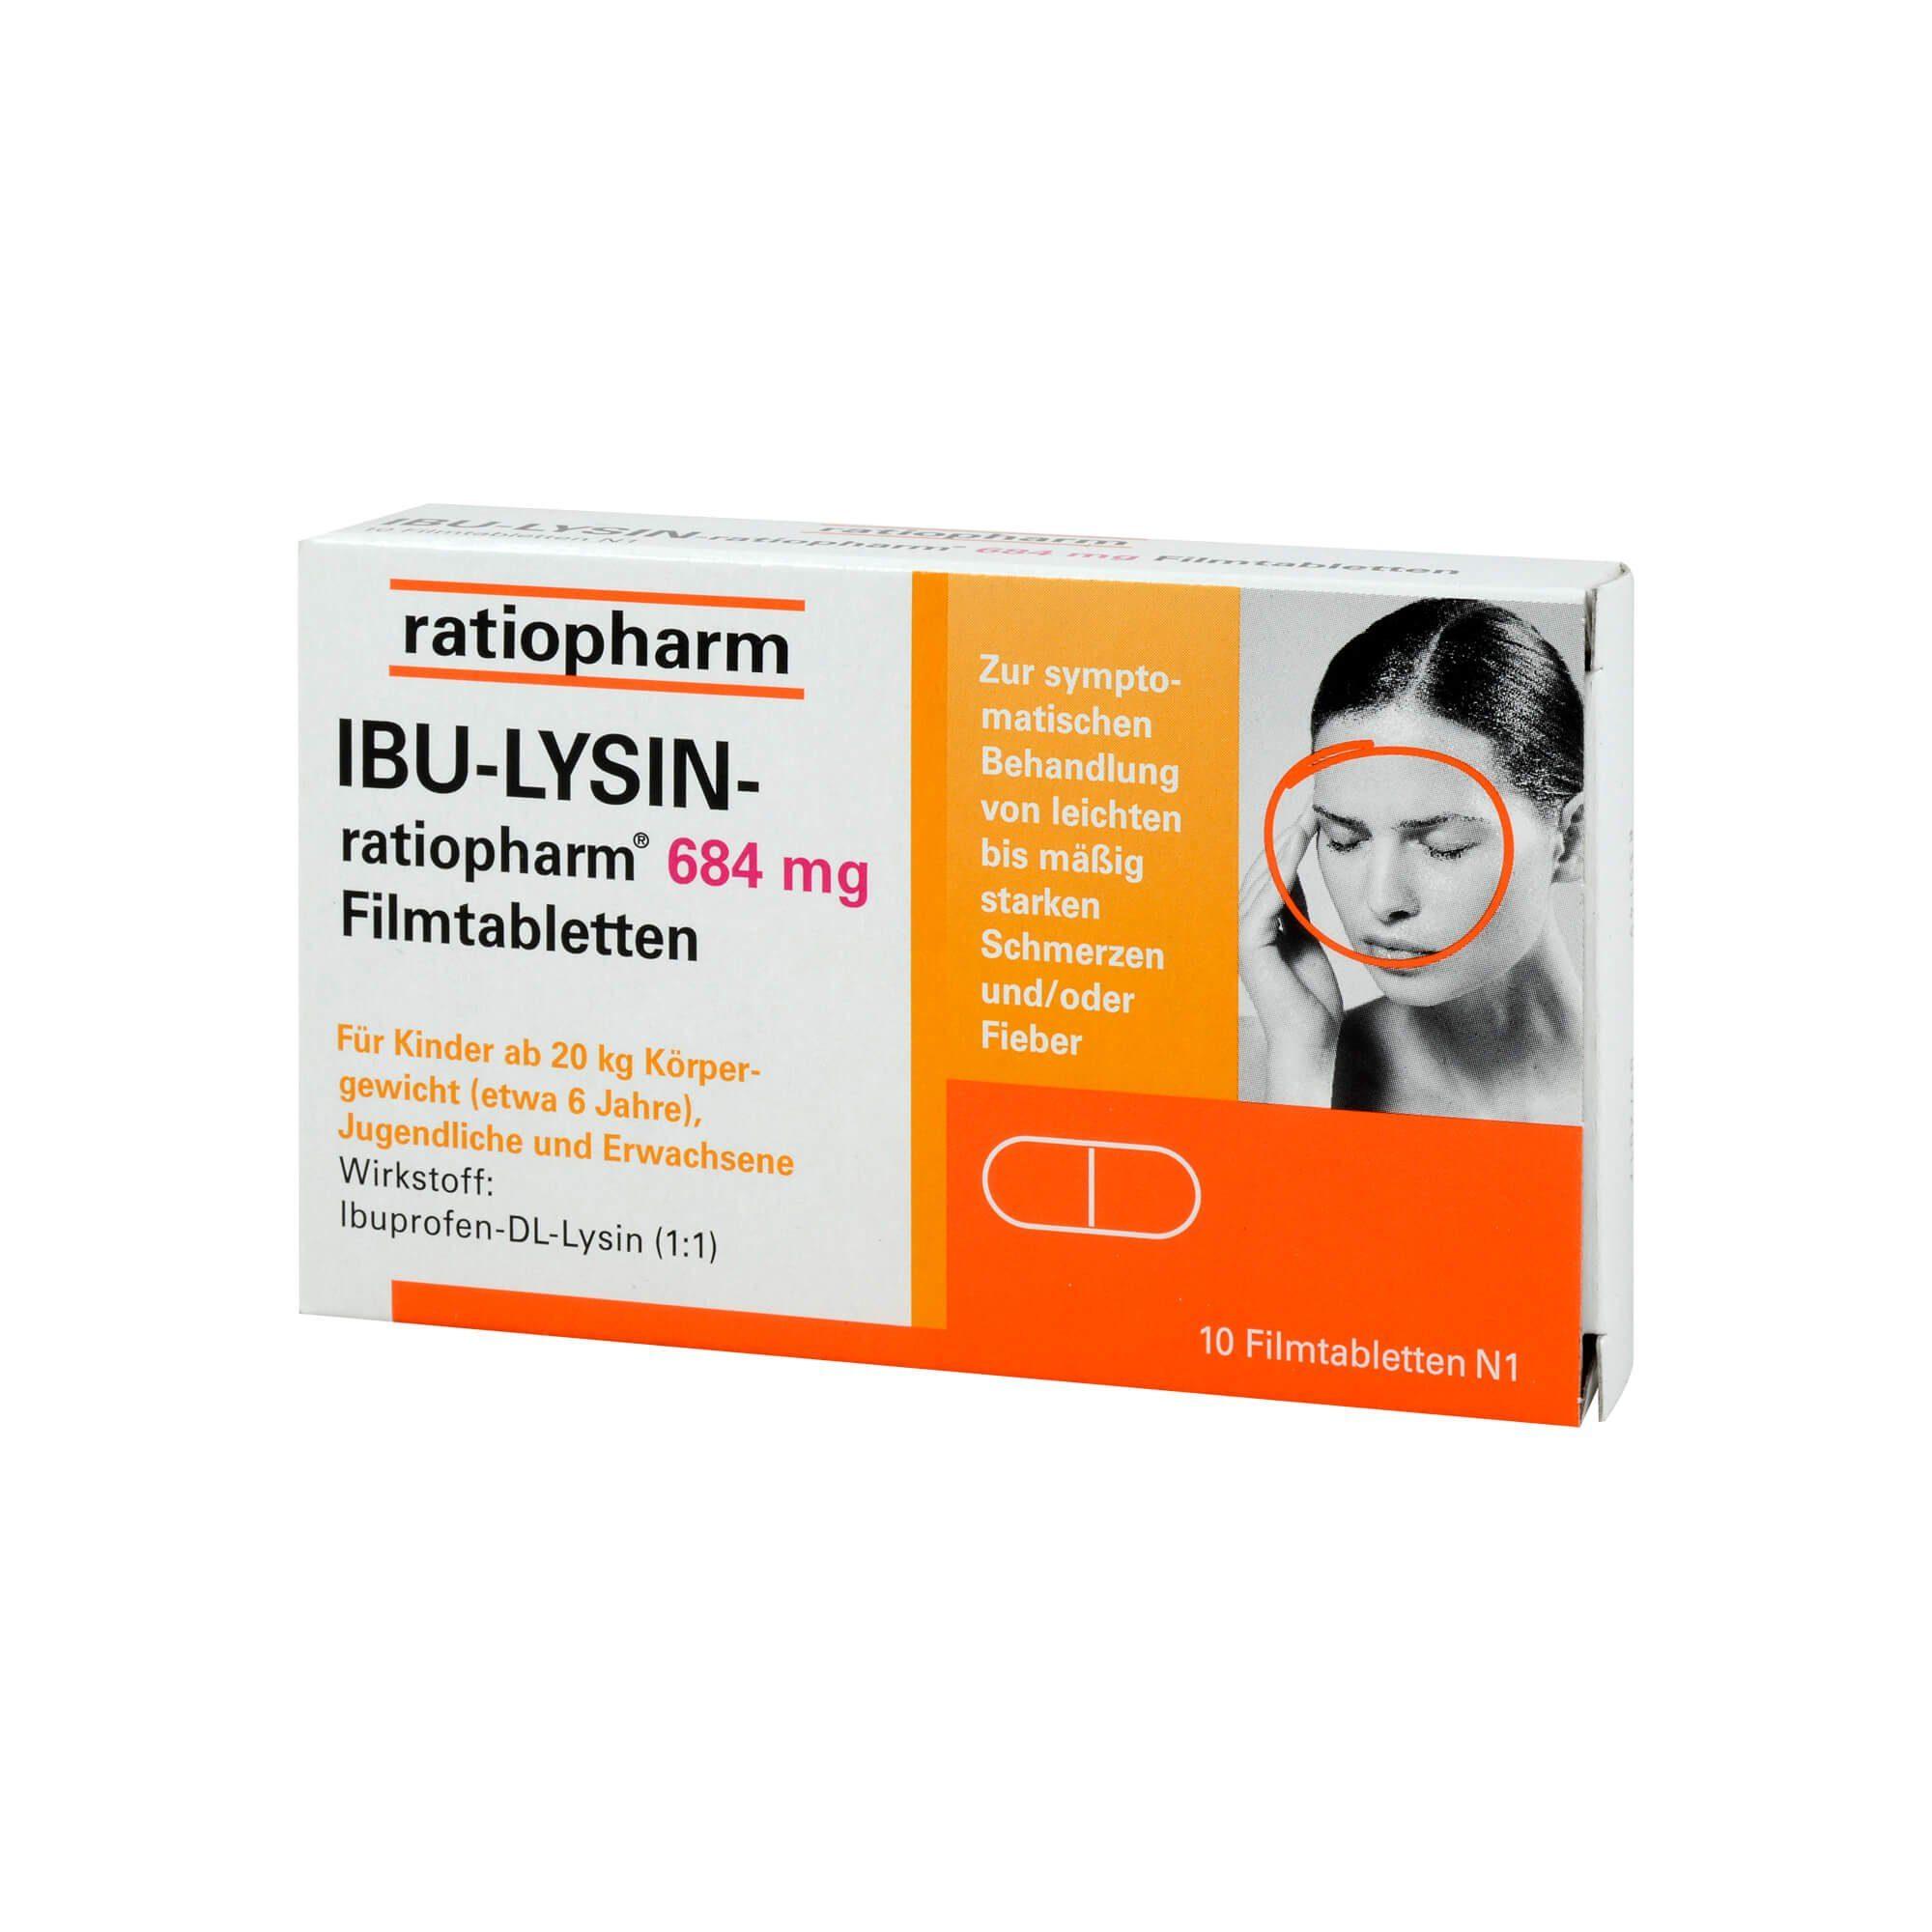 ratiopharm IBU-LYSIN-ratiopharm 684 mg , 10 St